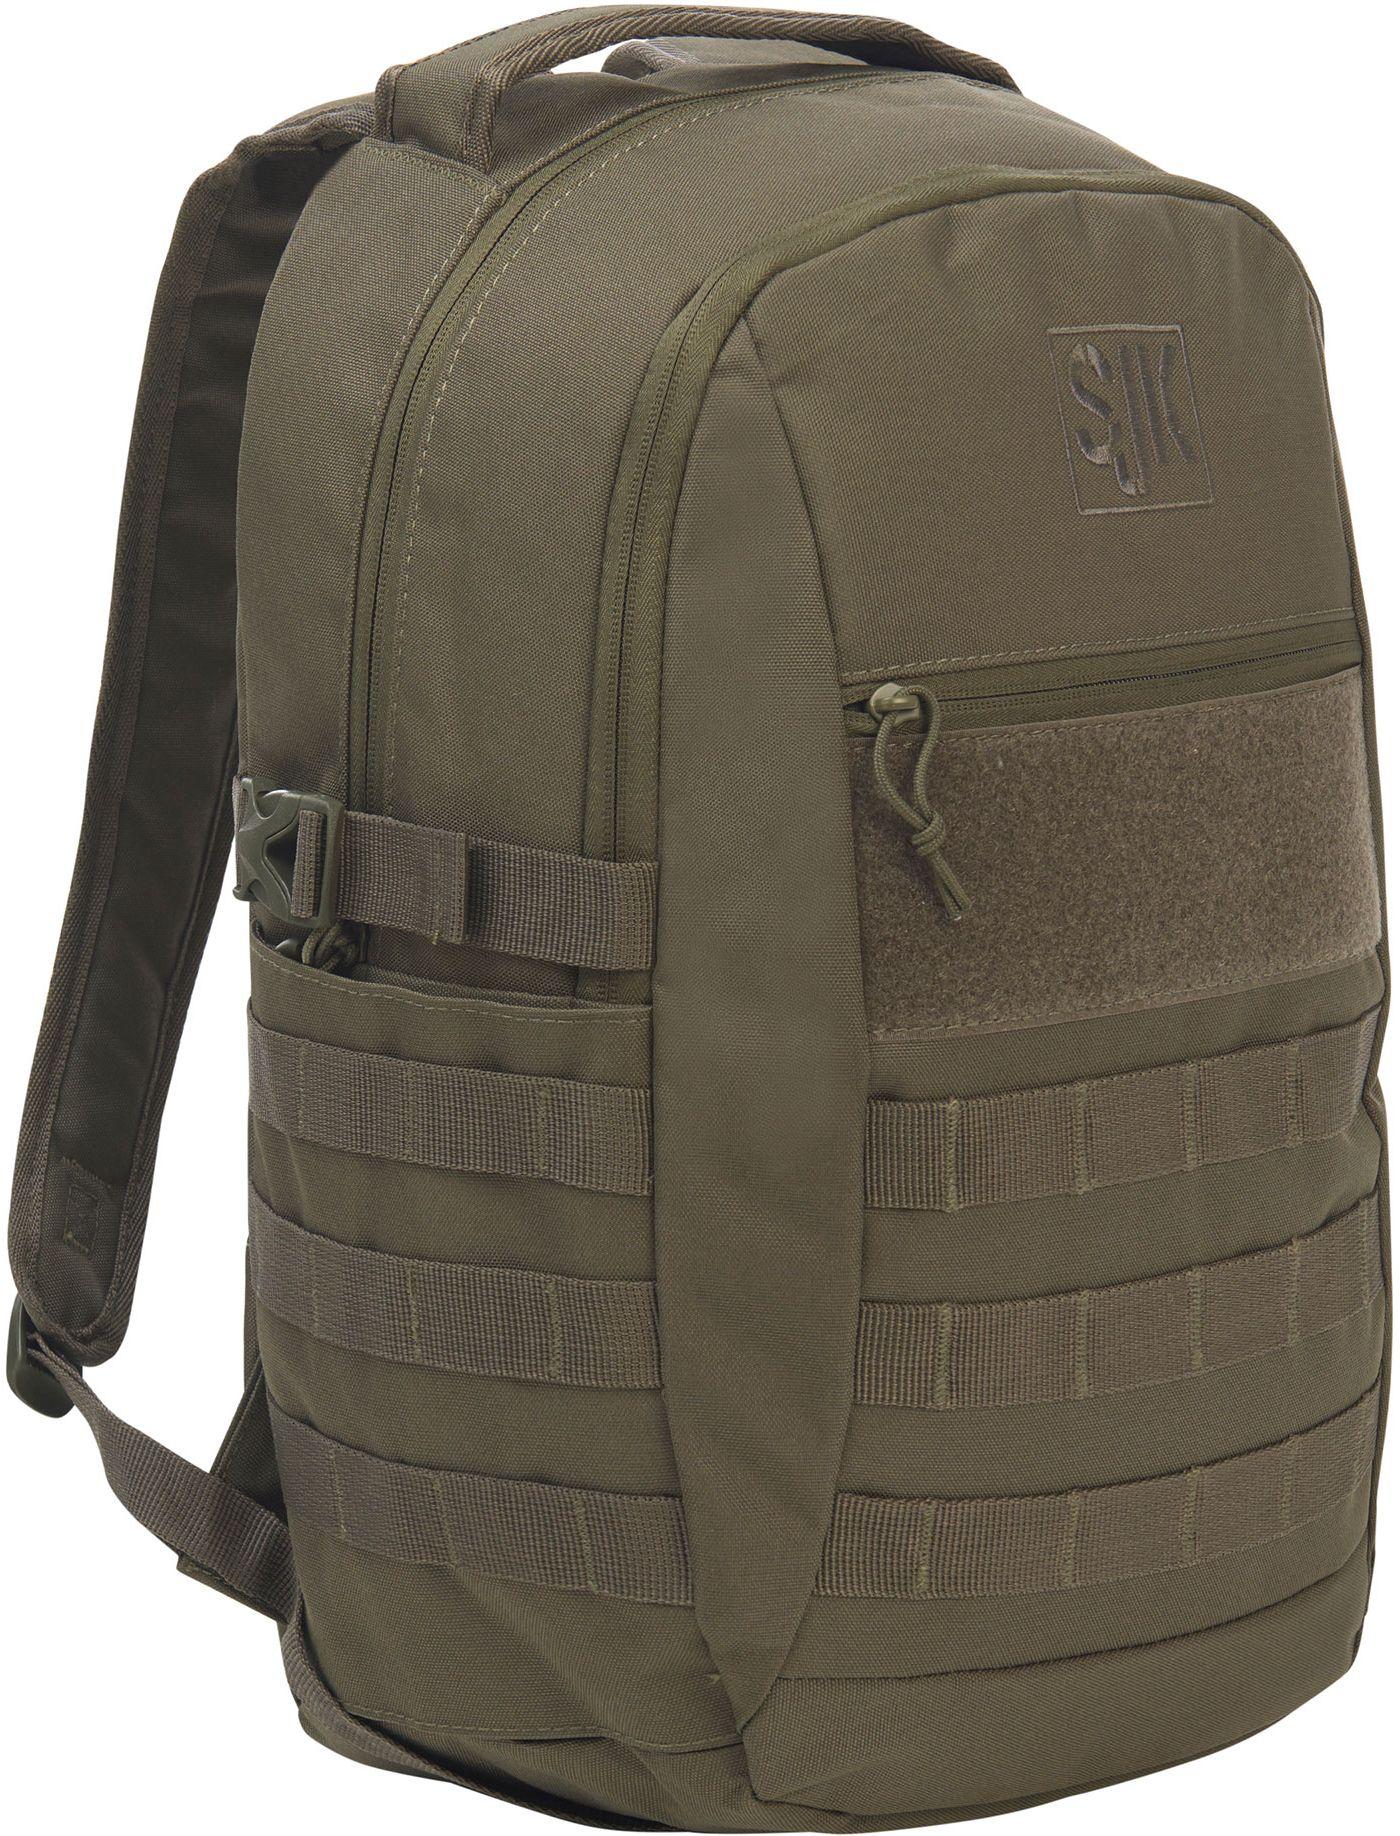 Slumberjack Chaos 20L Tactical Backpack